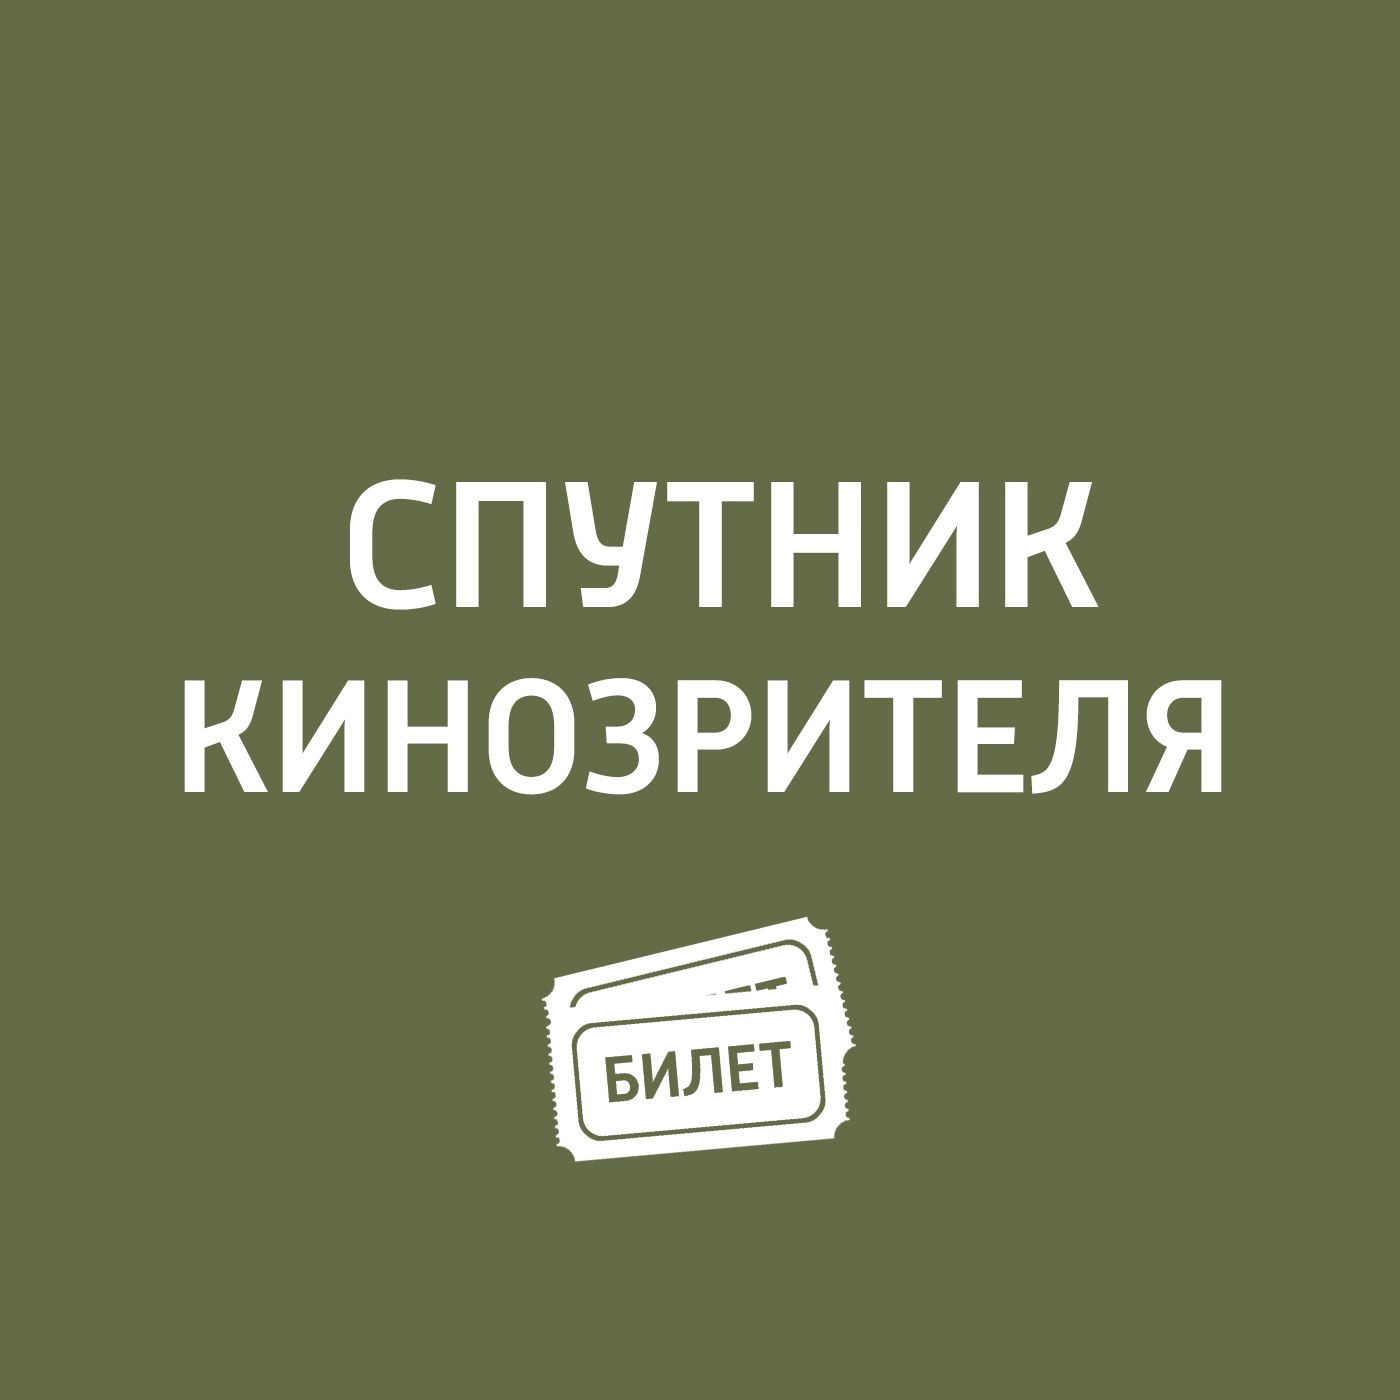 Антон Долин Антон Долин о Берлинале-2019 антон долин итоги премии оскар 2018